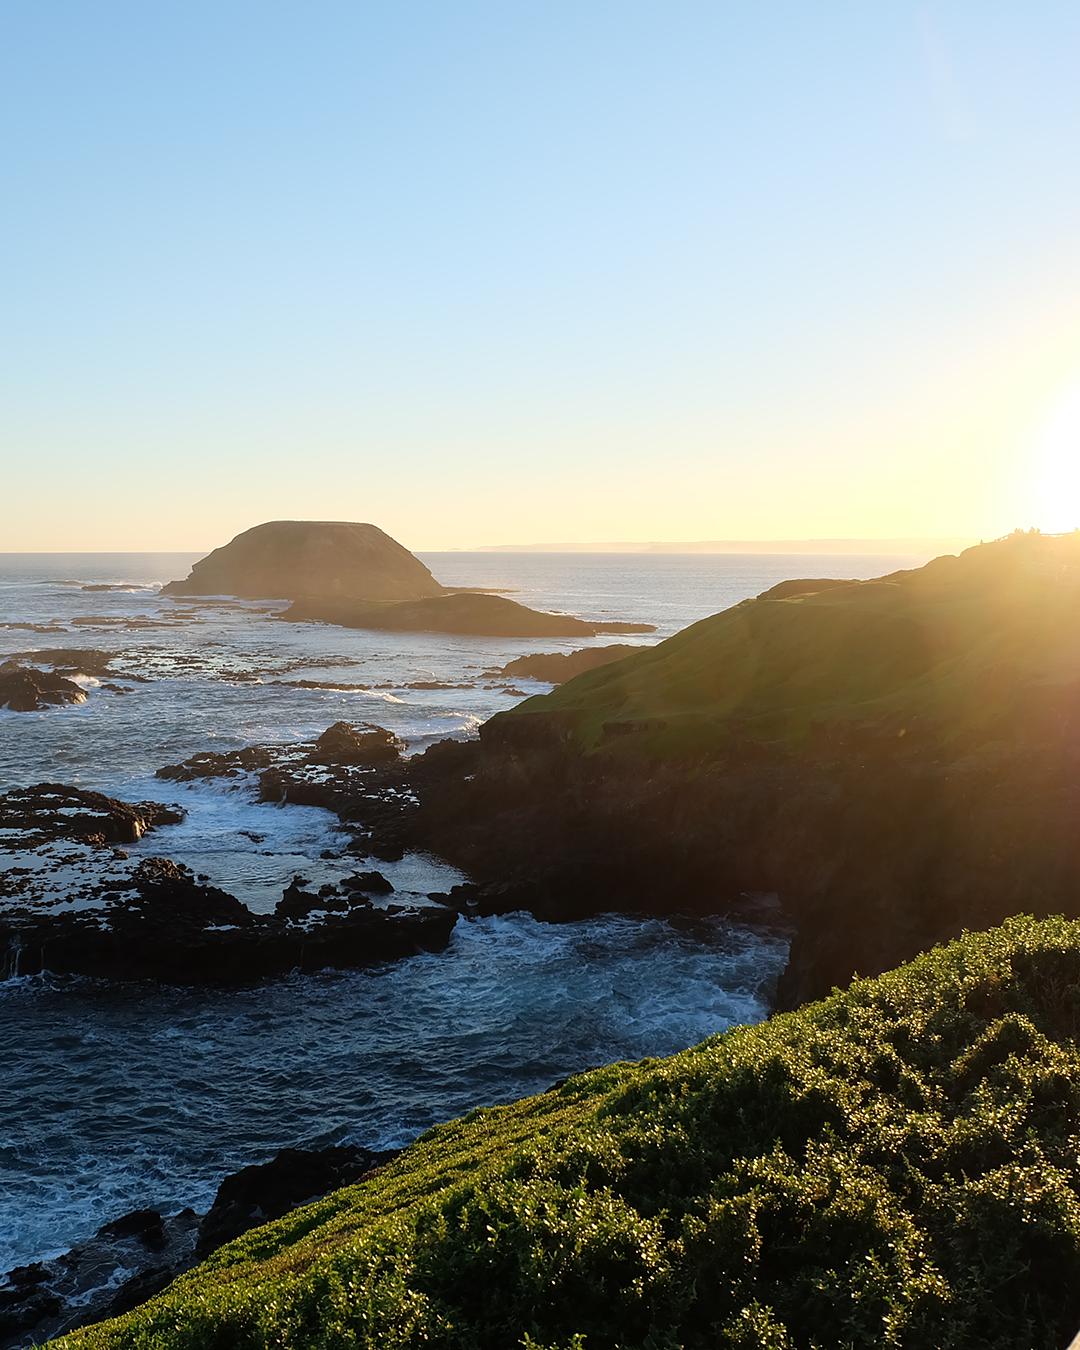 a stunning craggy coastline juts into blue ocean below.